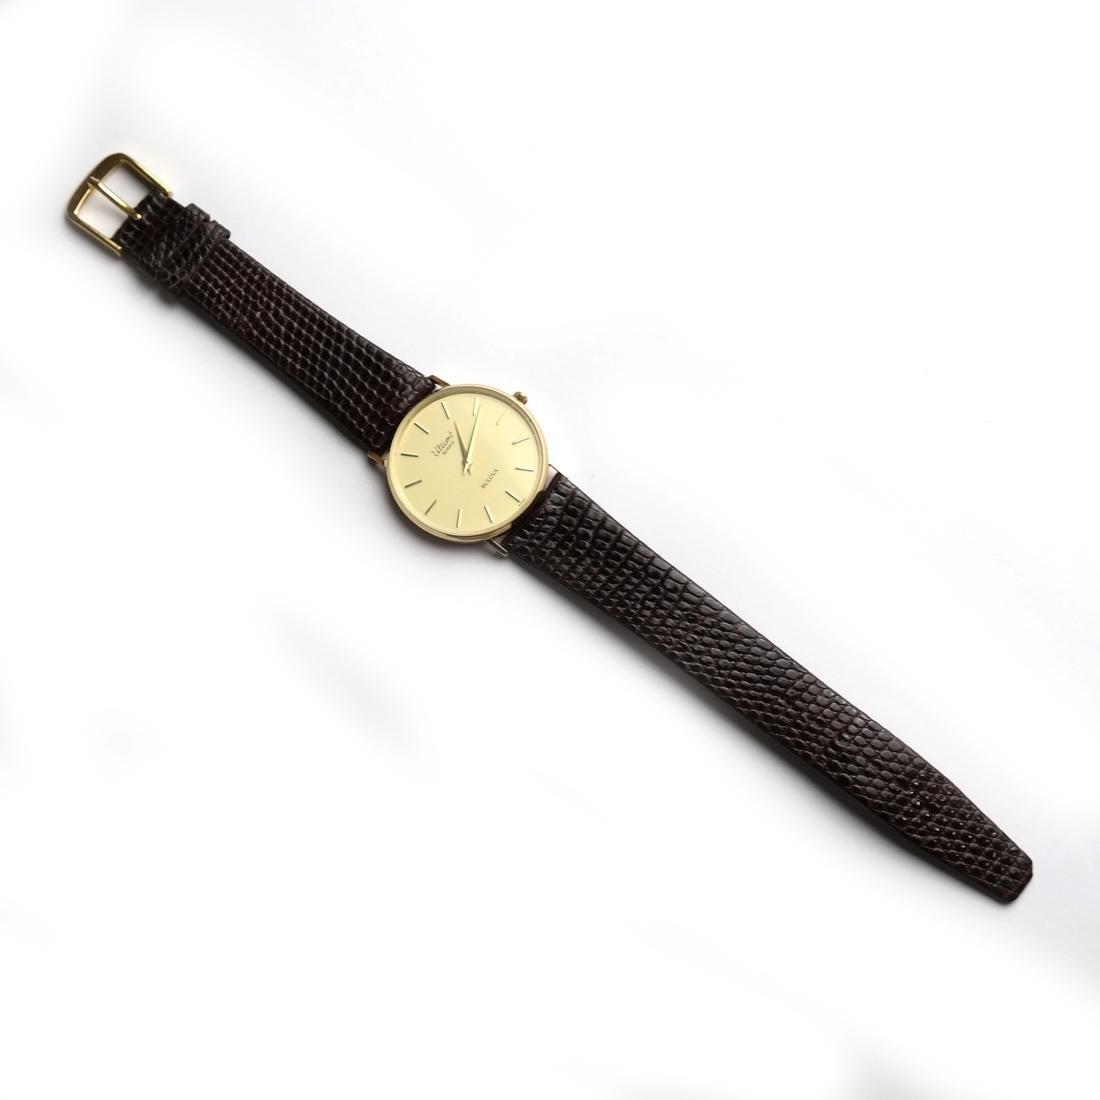 14k Gold Bulova Men's Watch